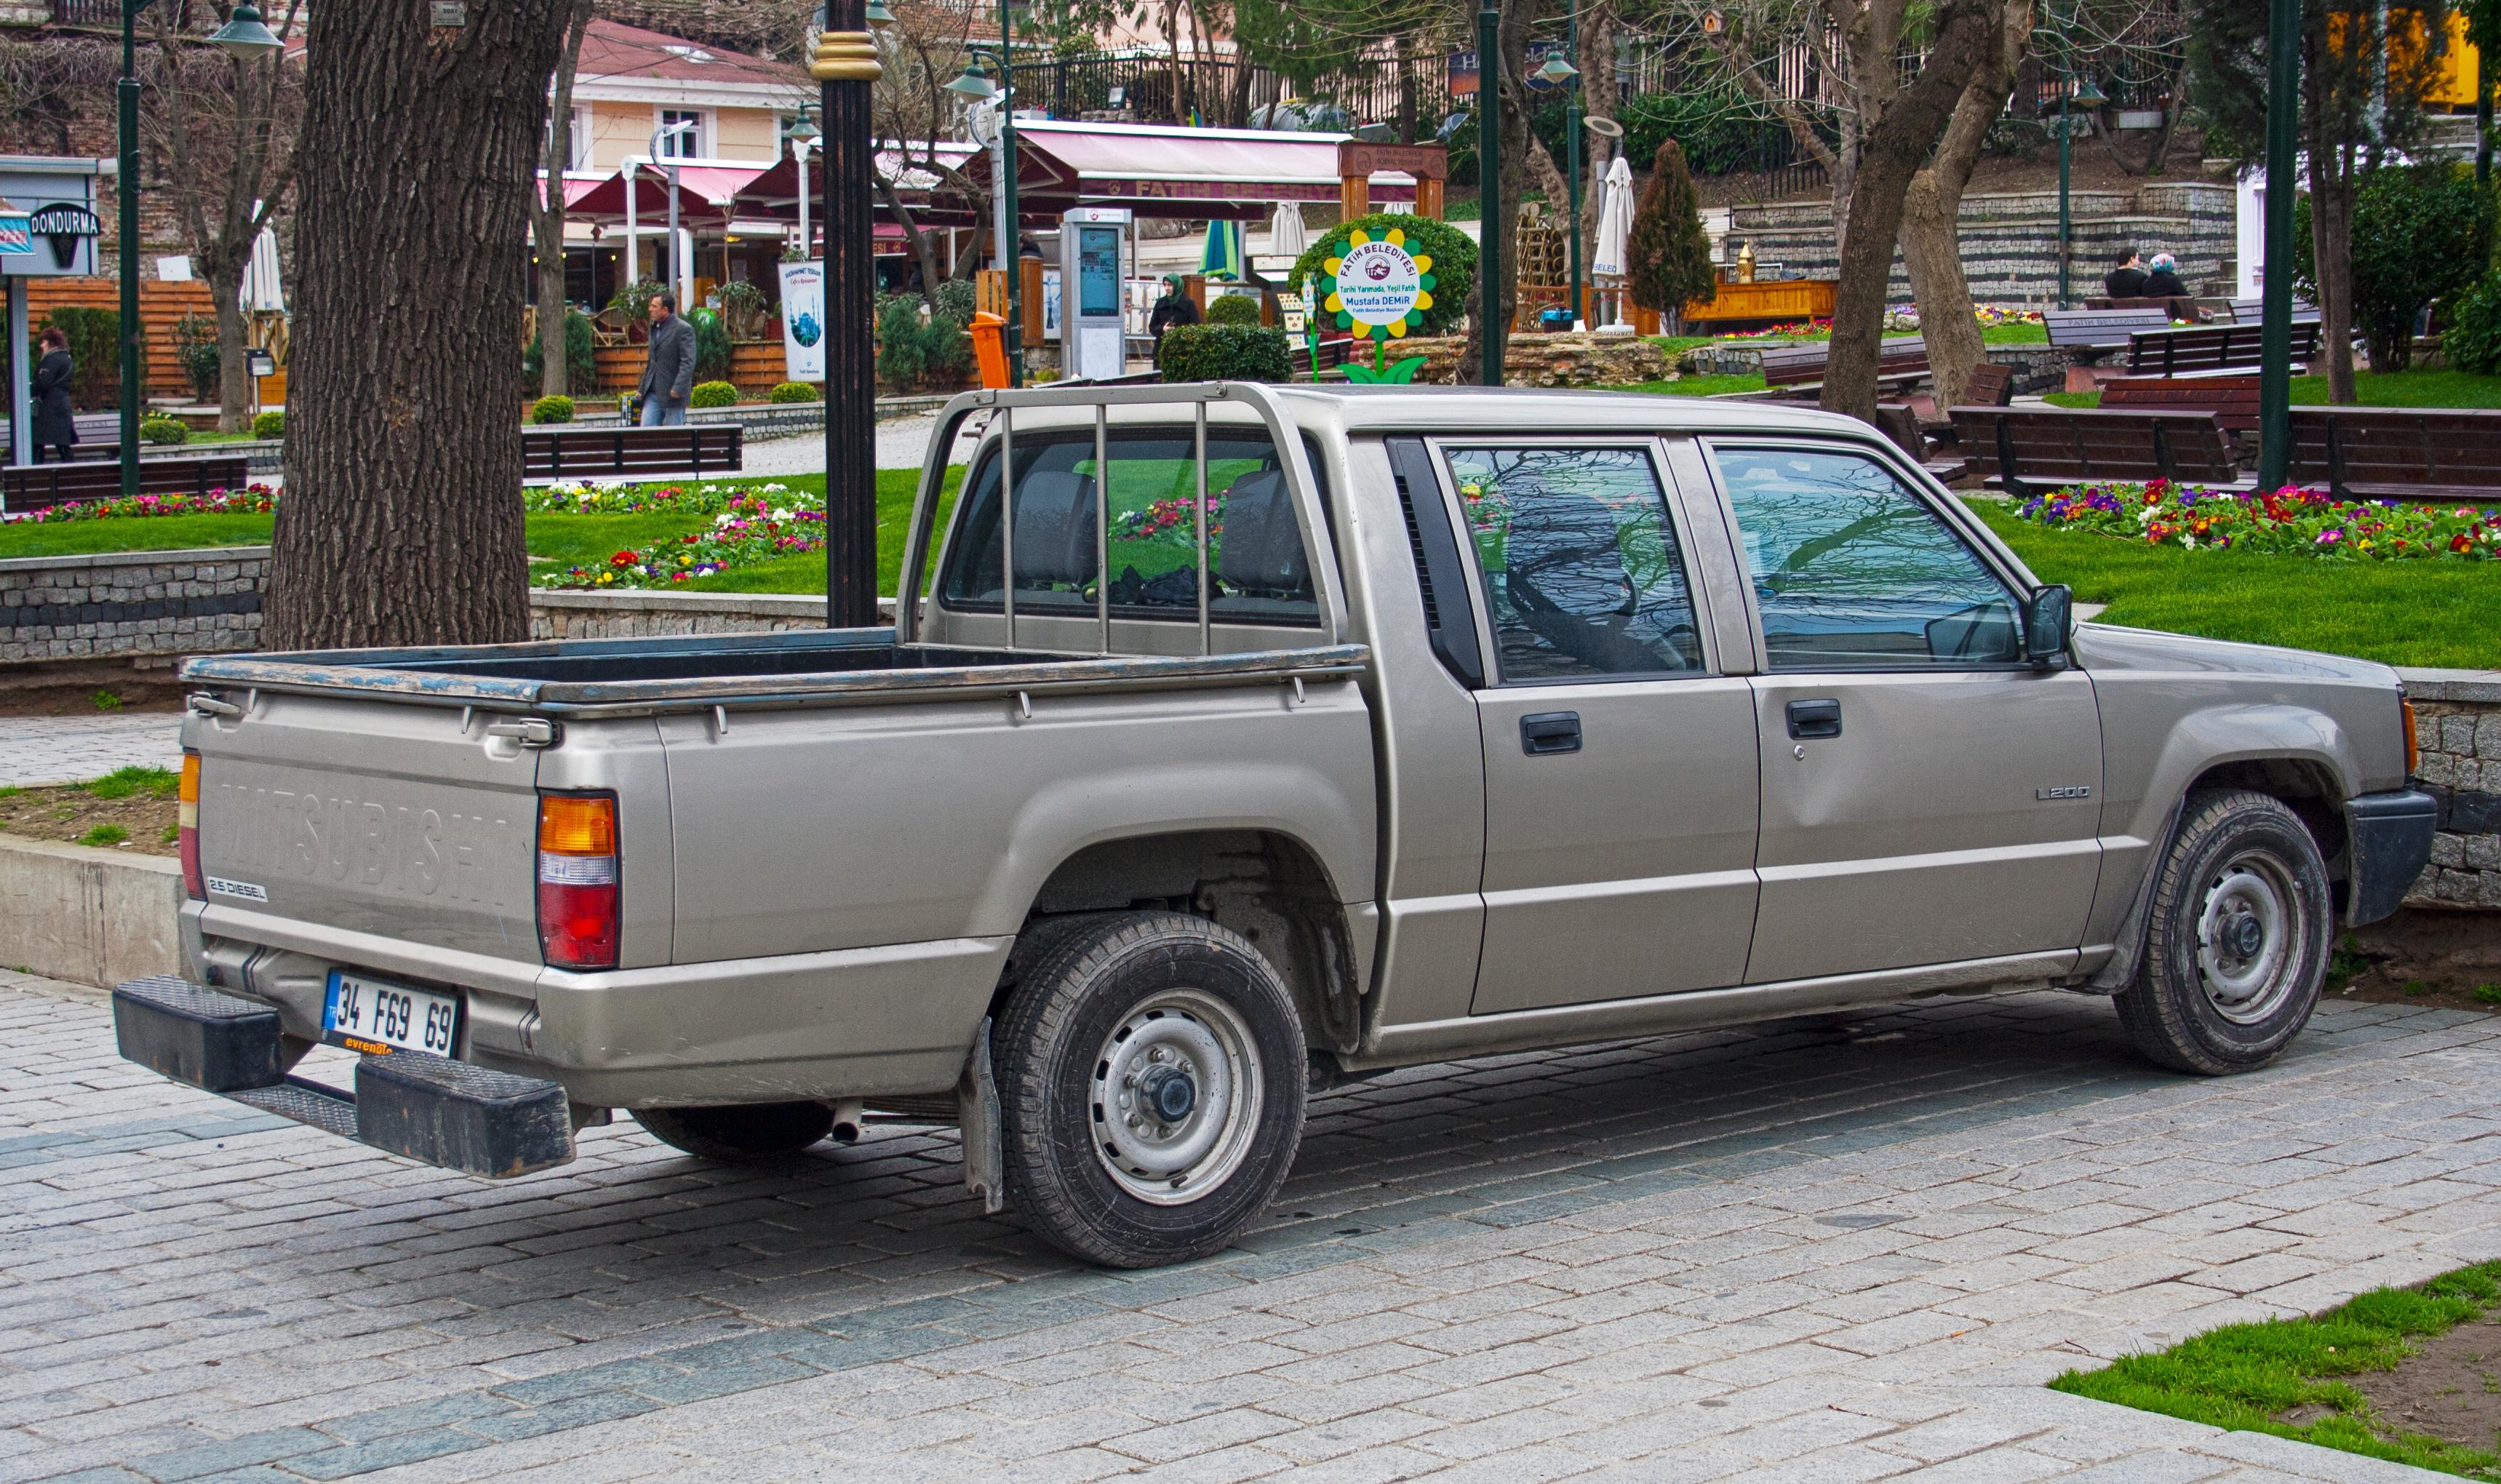 com tonne mitsubishi pickup offers myautoworld towing trucks autonews capacity